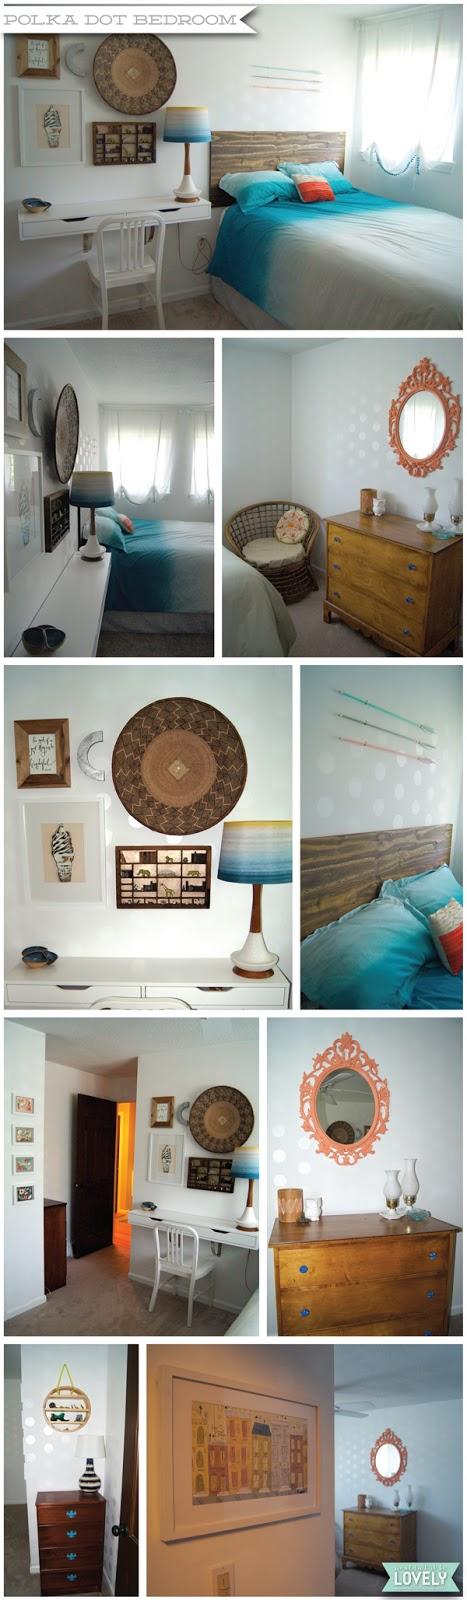 polkadotbedroom-1.jpg